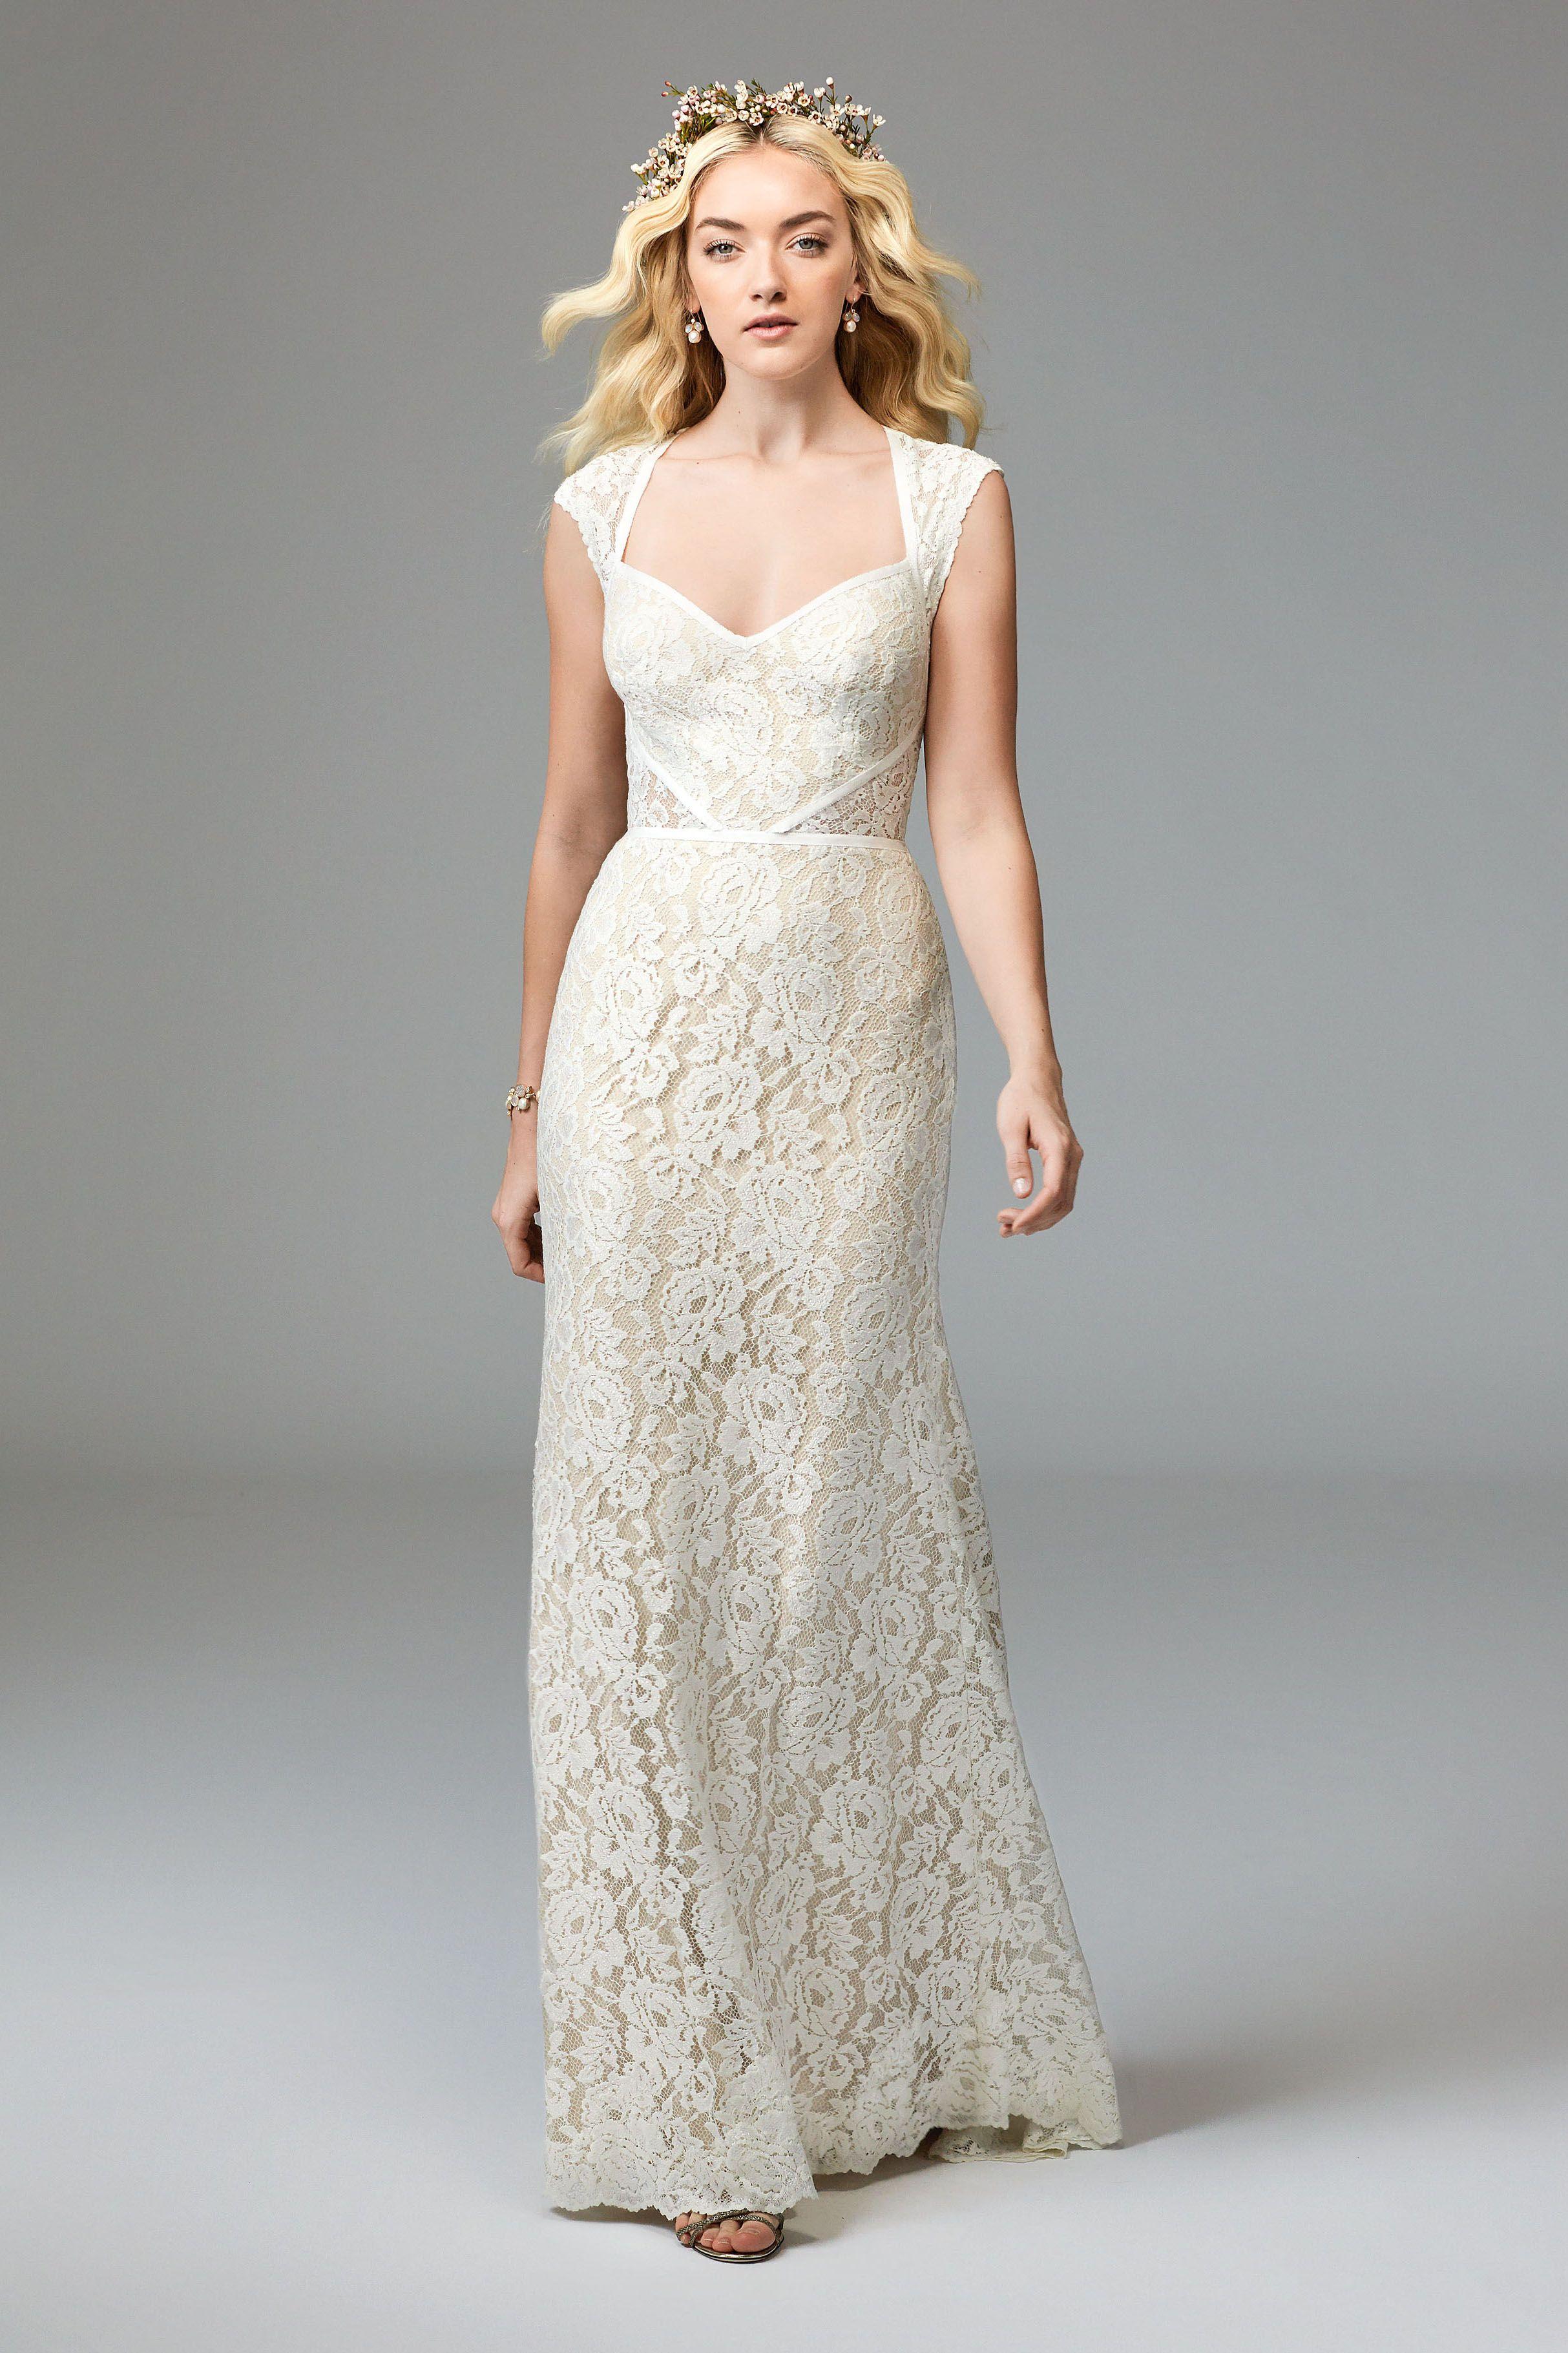 Watterswtoo Willowby Style 57114 Twilla Wedding Dress Watters Wedding Dress Wedding Dresses Photos Floor Length Wedding Dress [ 3642 x 2427 Pixel ]